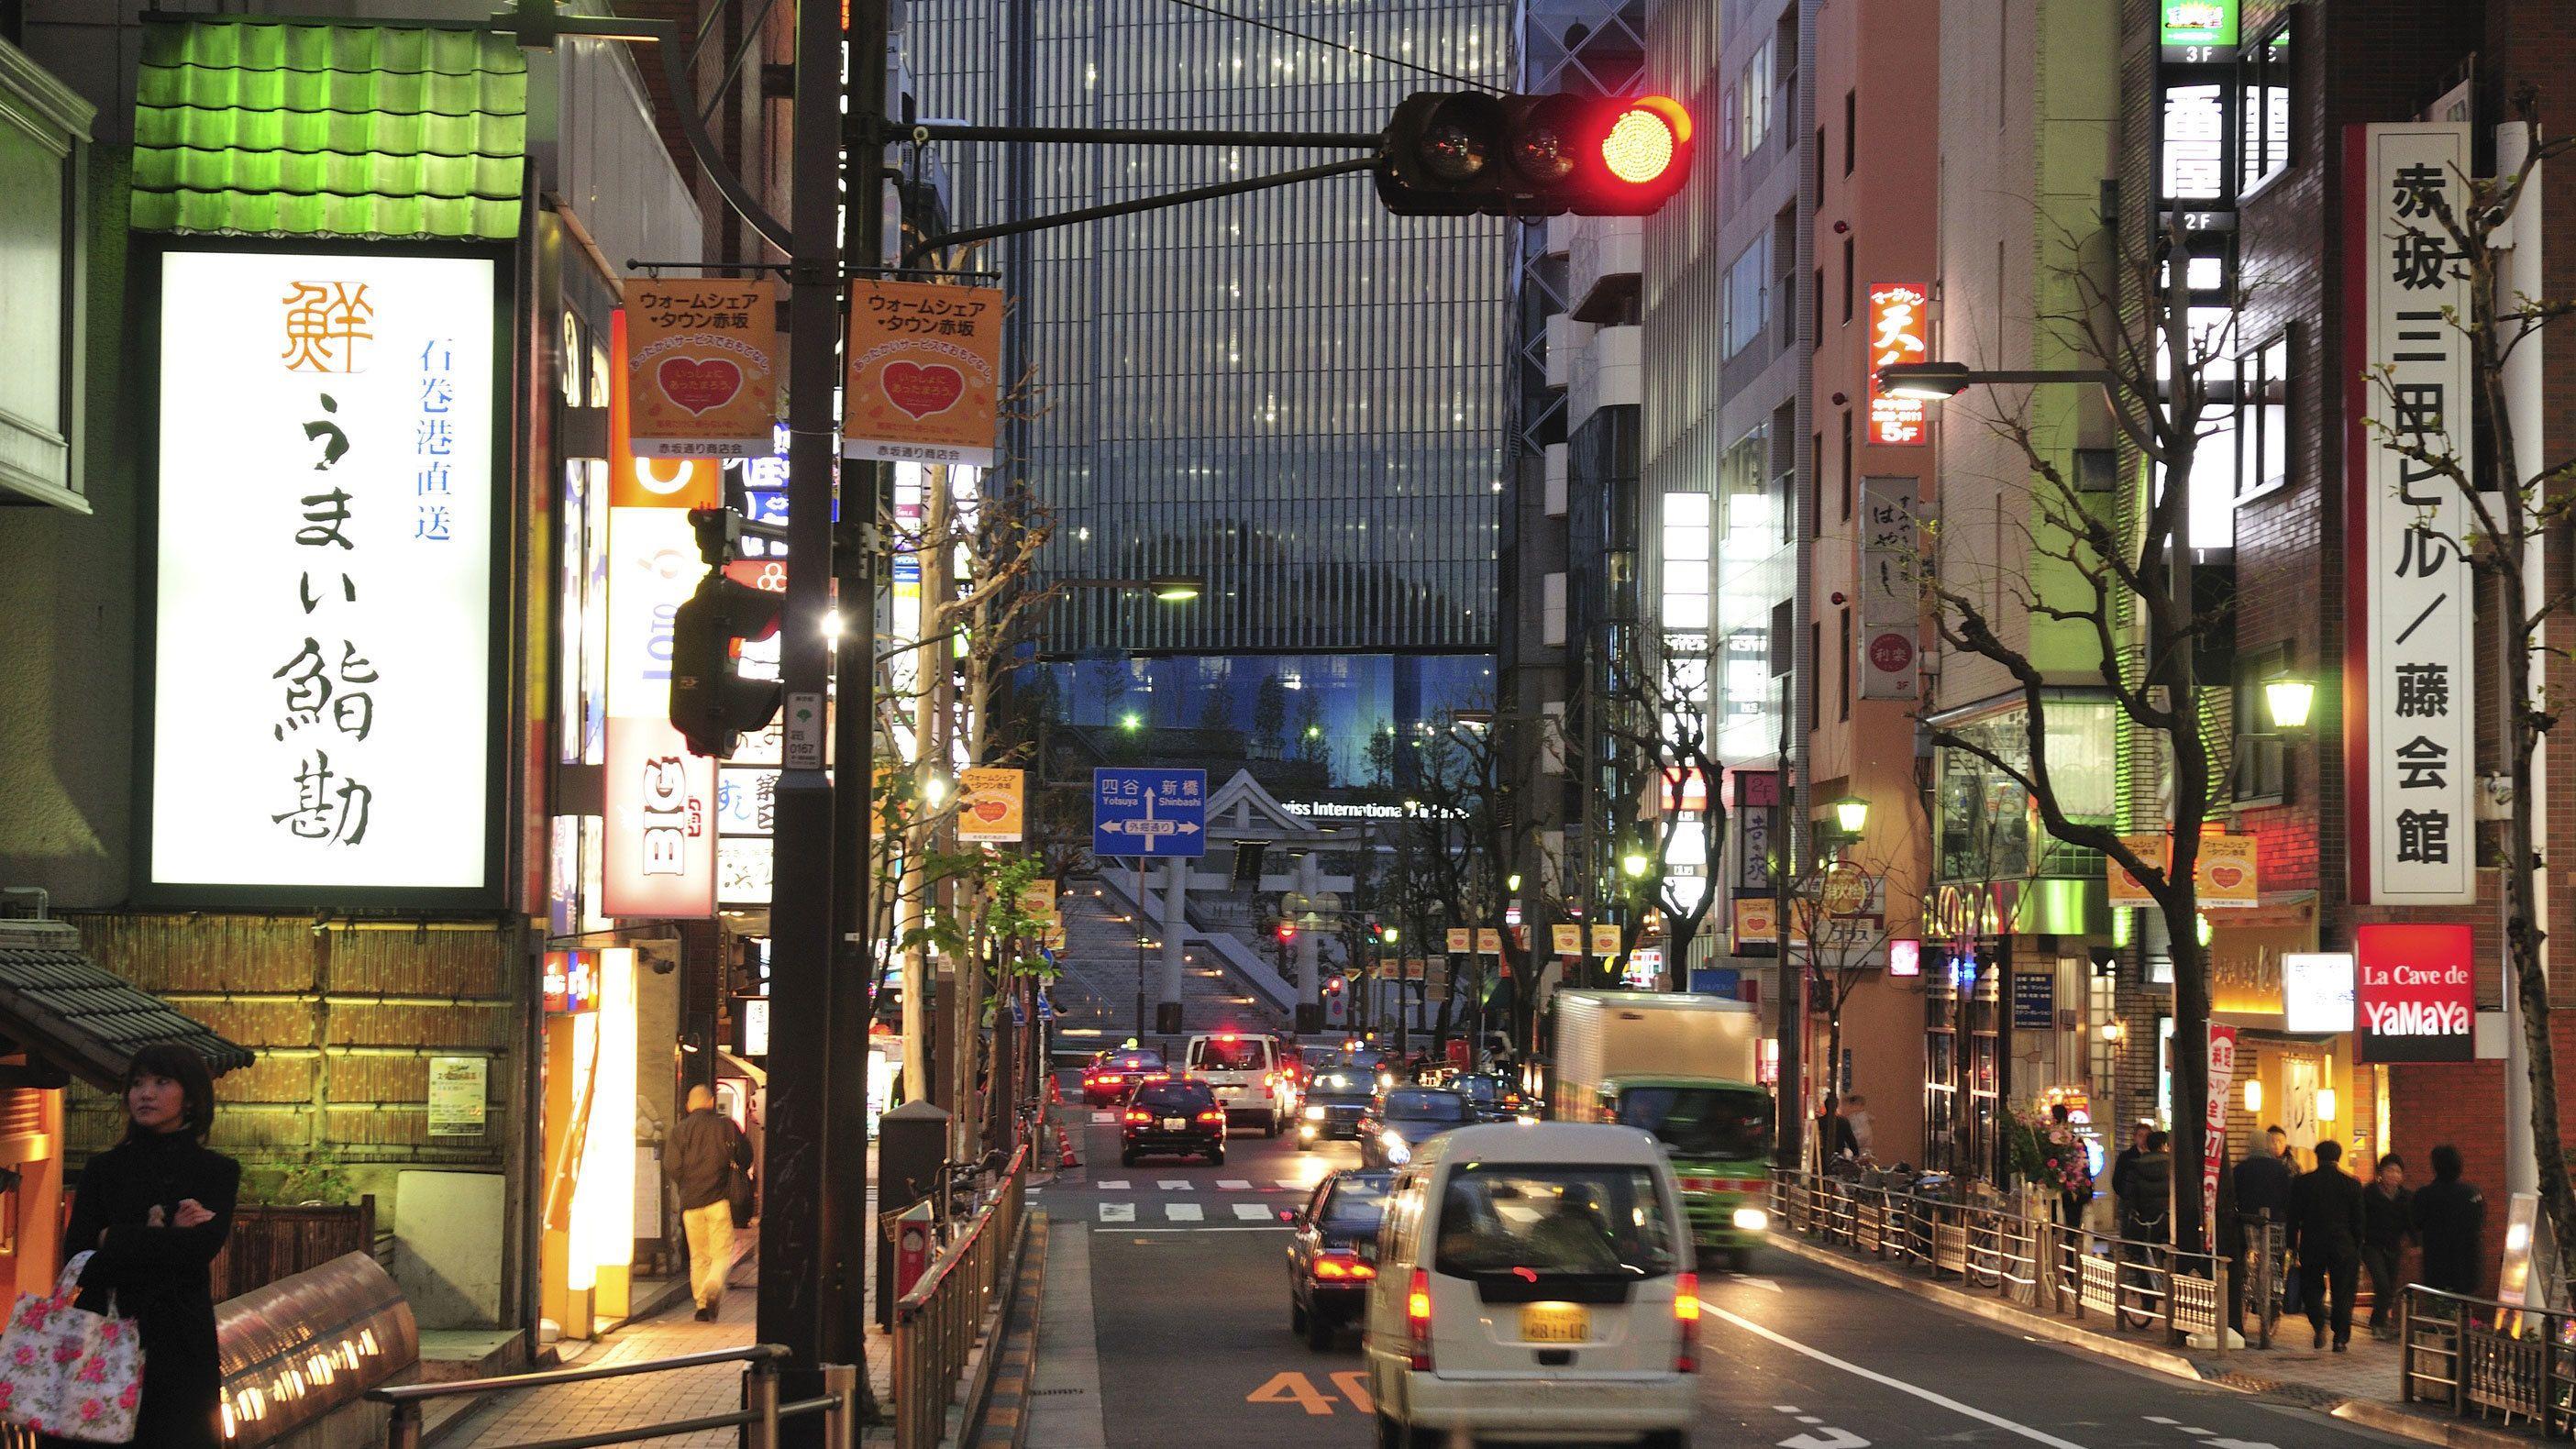 Street view of urban Tokyo